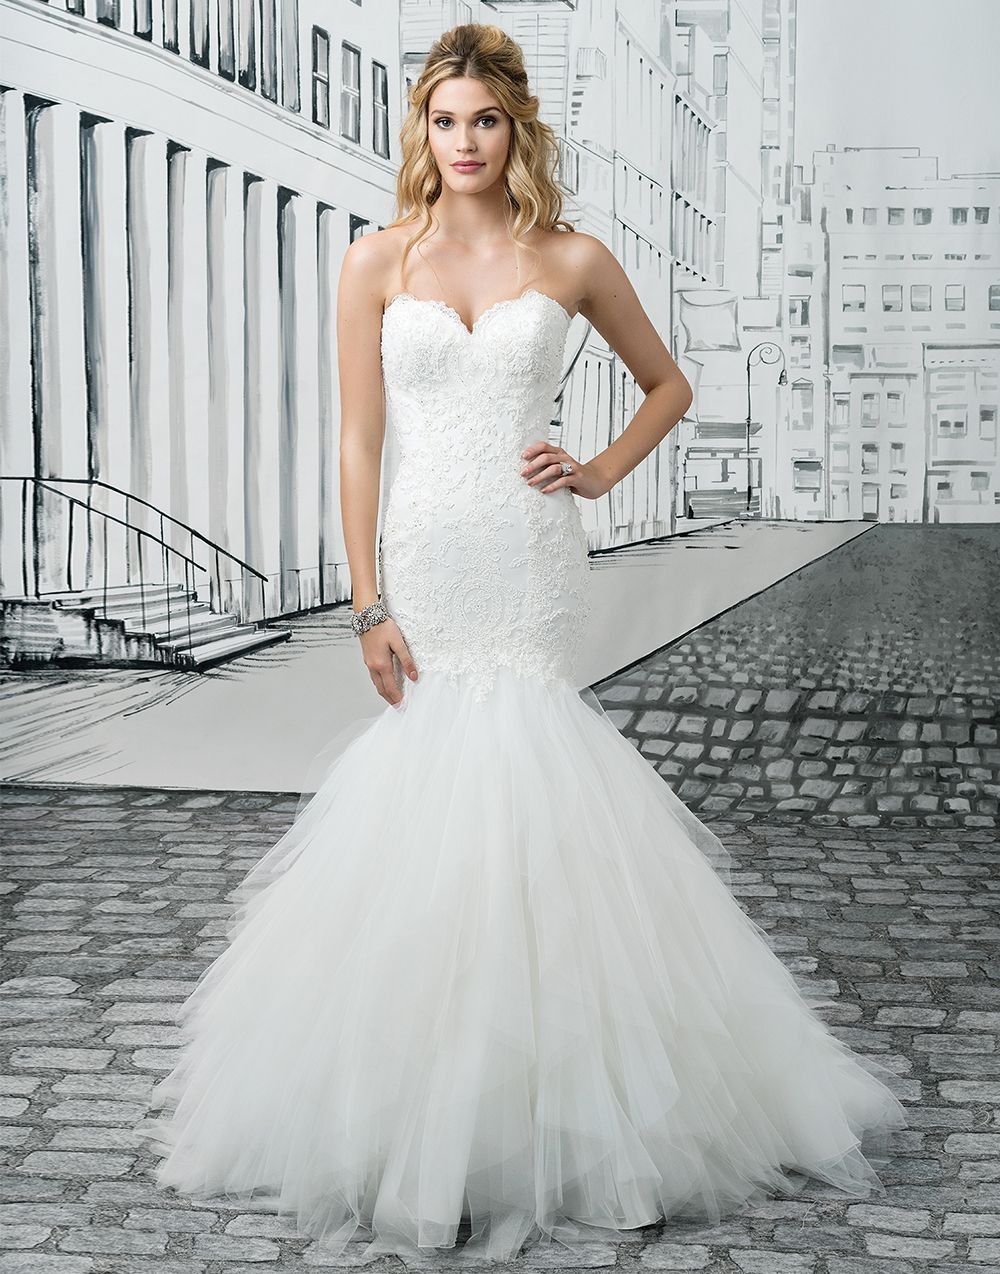 Justin alexander wedding dresses style bridal boutique